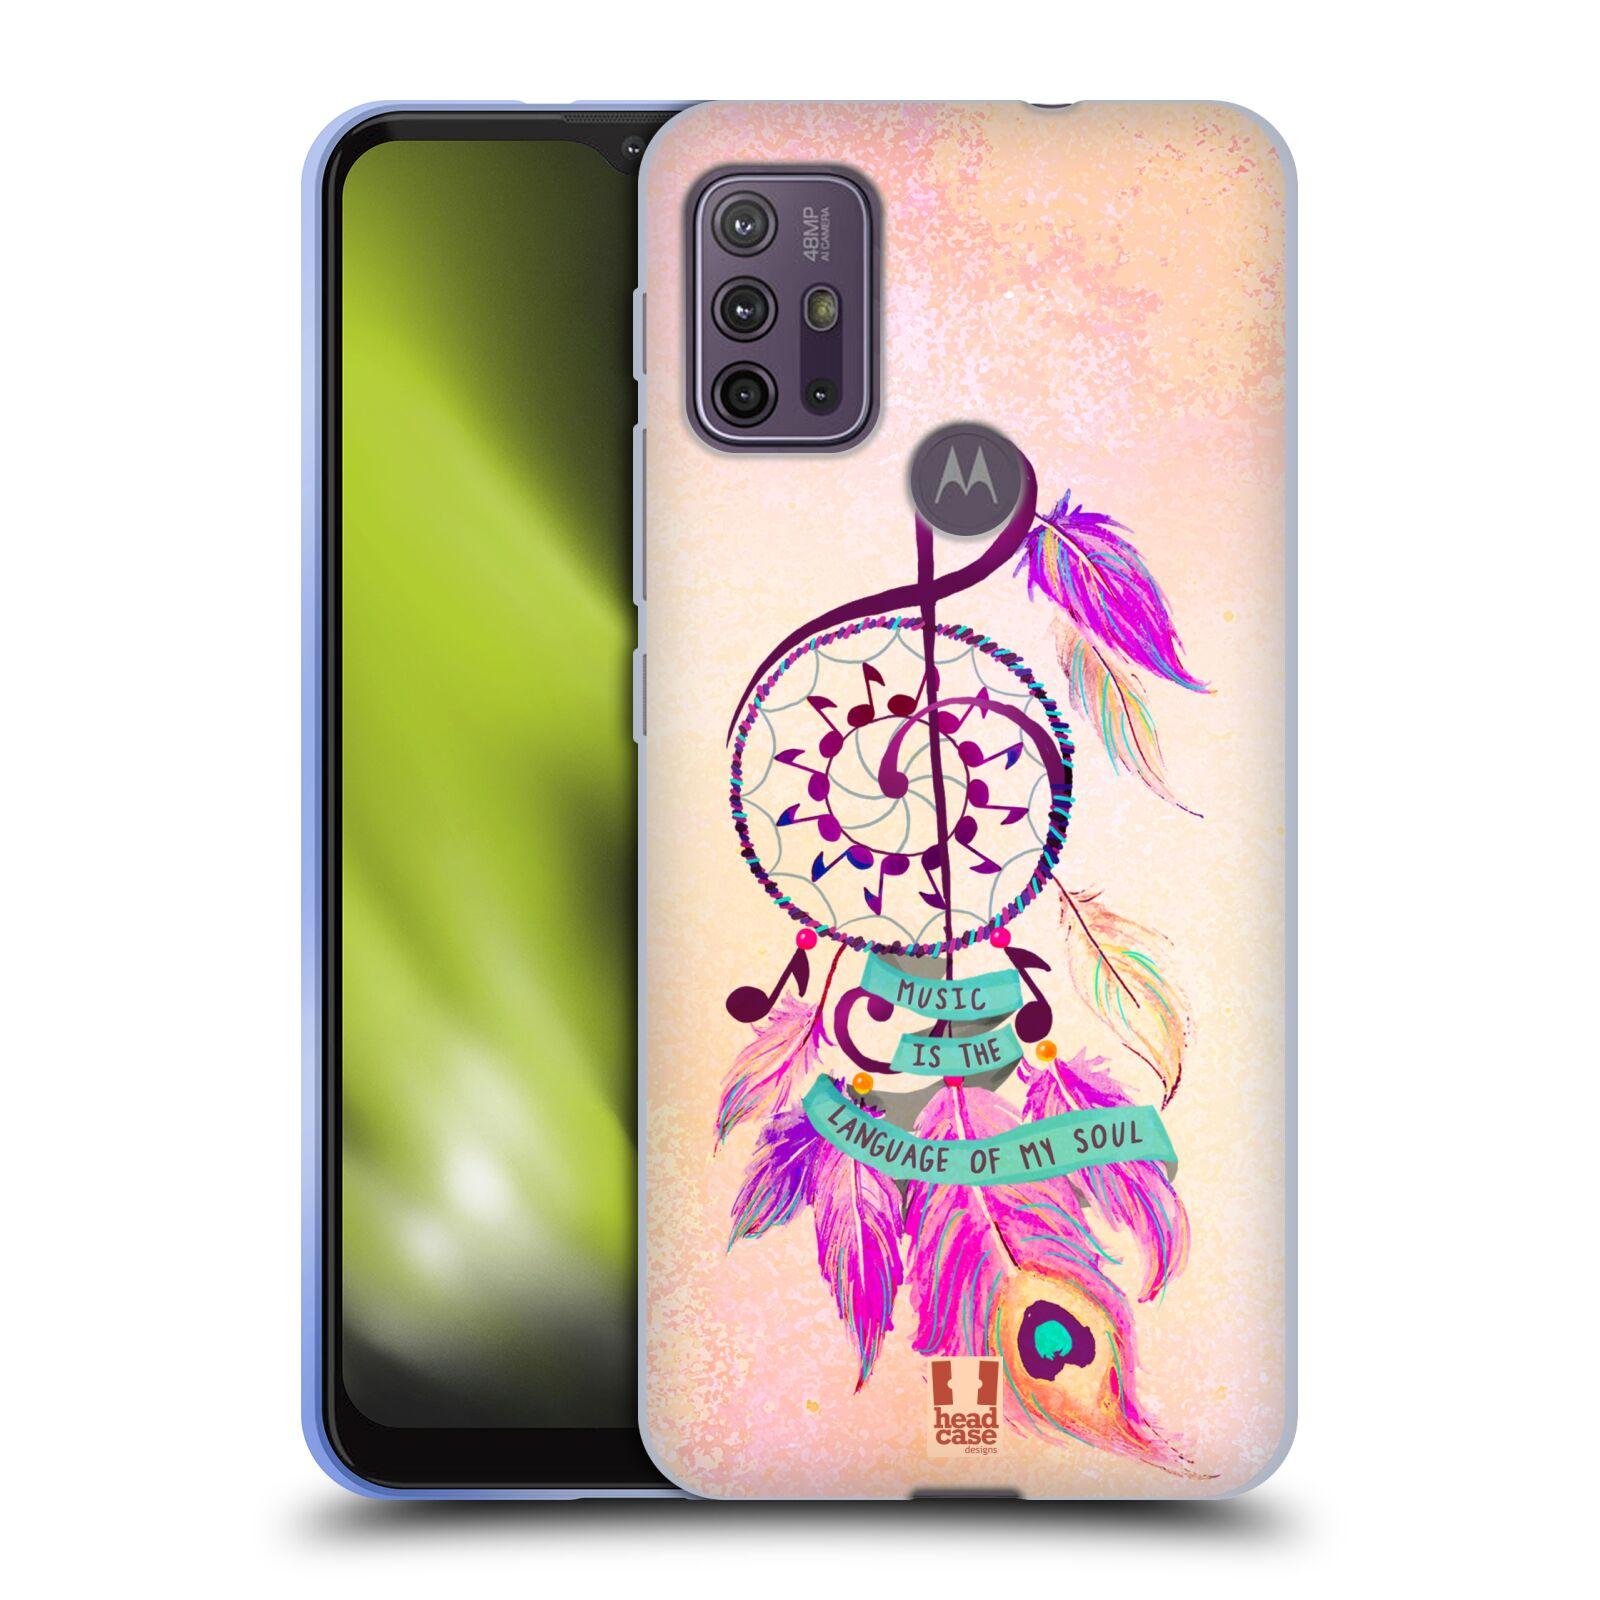 Silikonové pouzdro na mobil Motorola Moto G10 / G30 - Head Case - Lapač Assorted Music